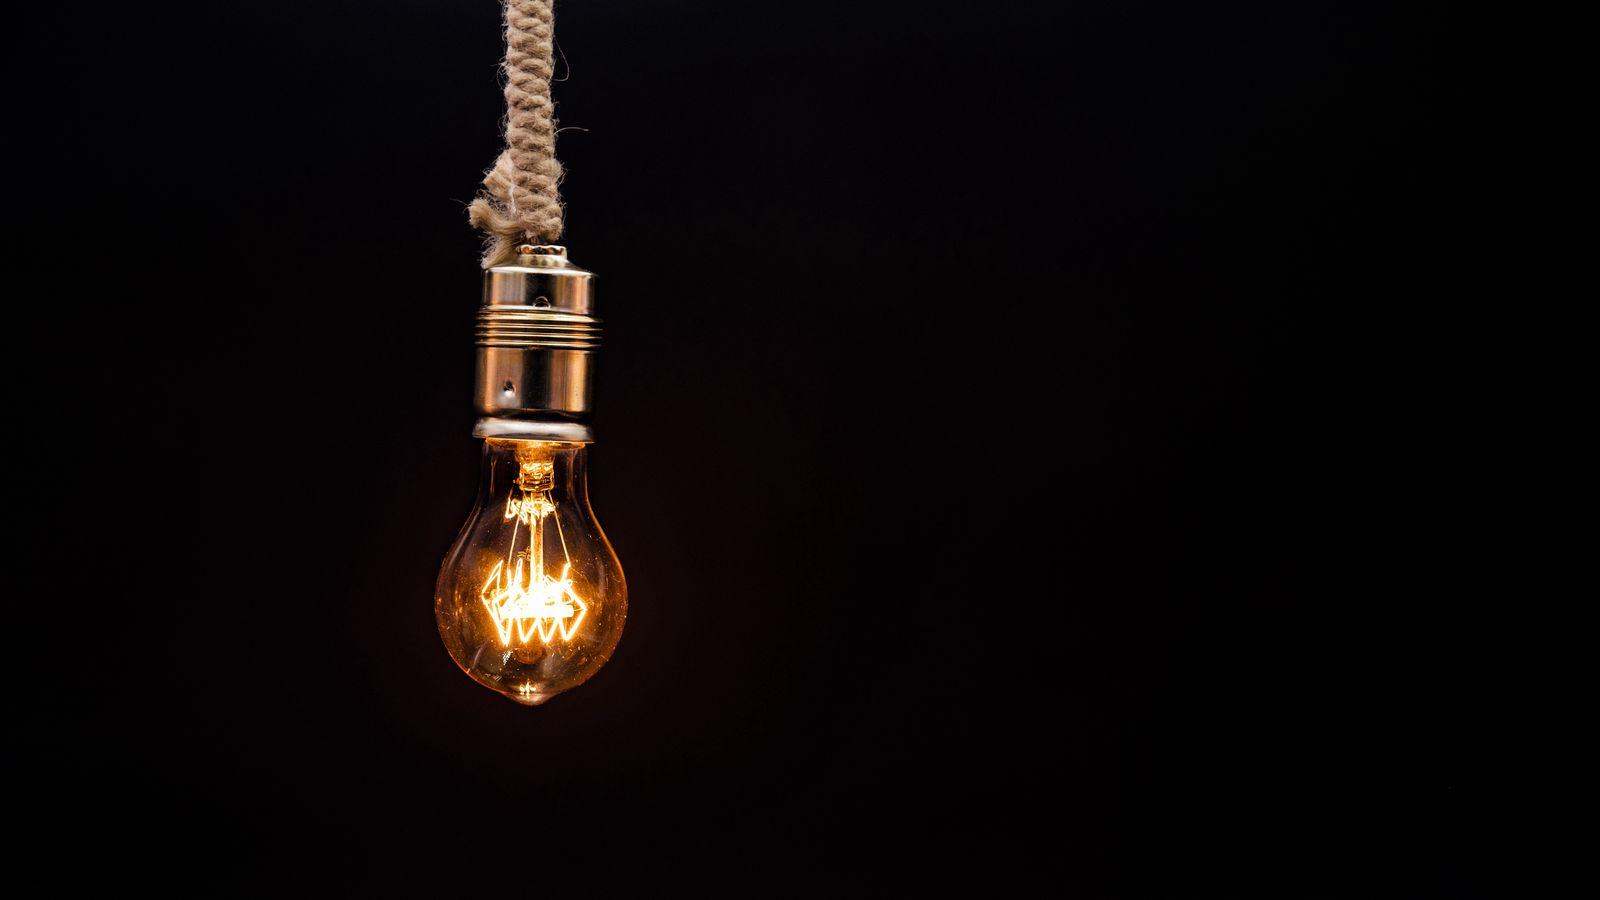 1600x900 Wallpaper bulb, lighting, rope, electricity, edisons lamp